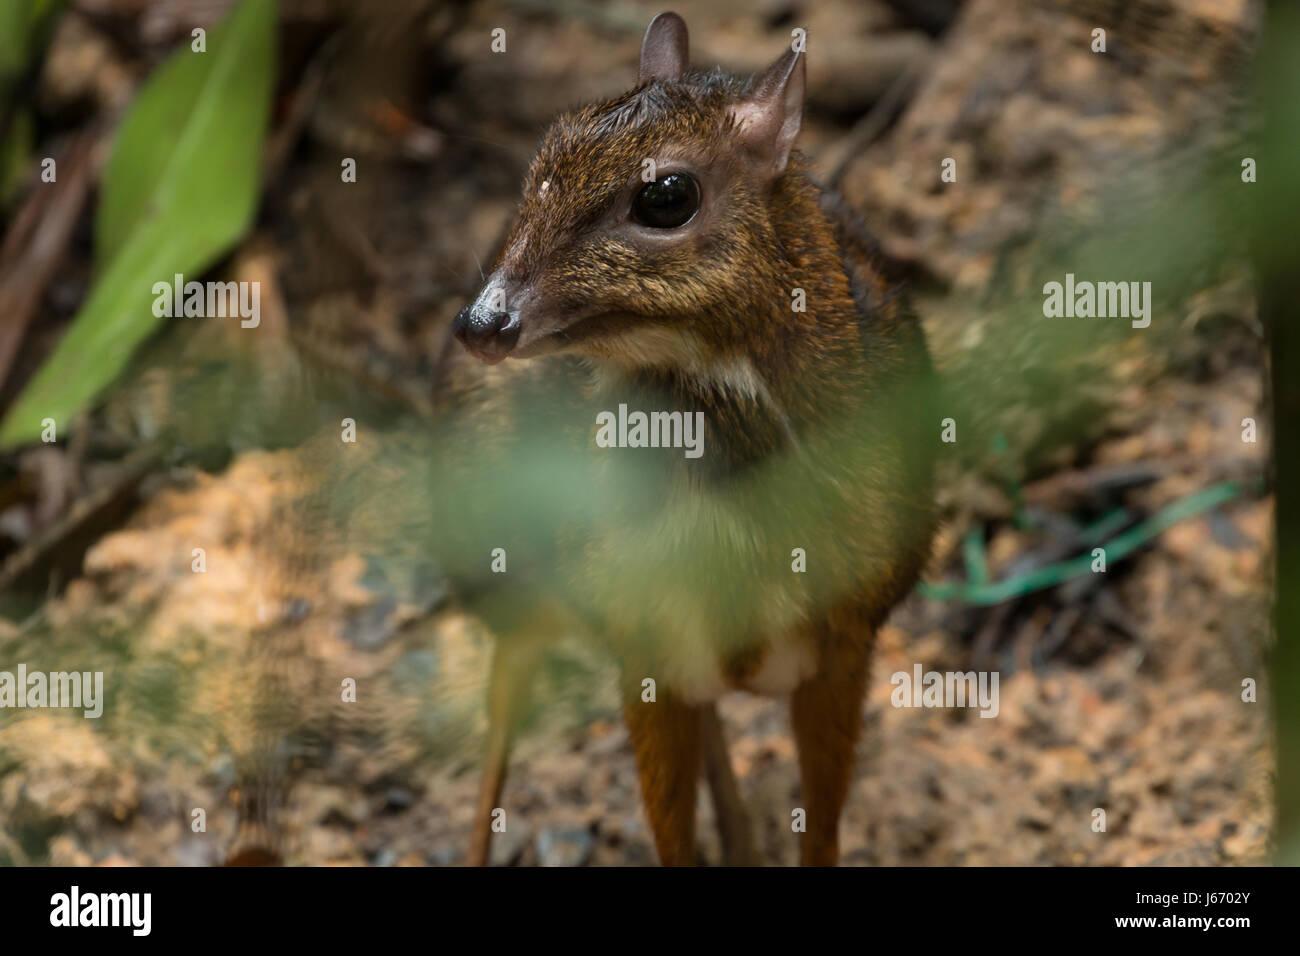 Timida mouse deer (Chevrotain) nascondersi dietro Bush in Singapore Immagini Stock